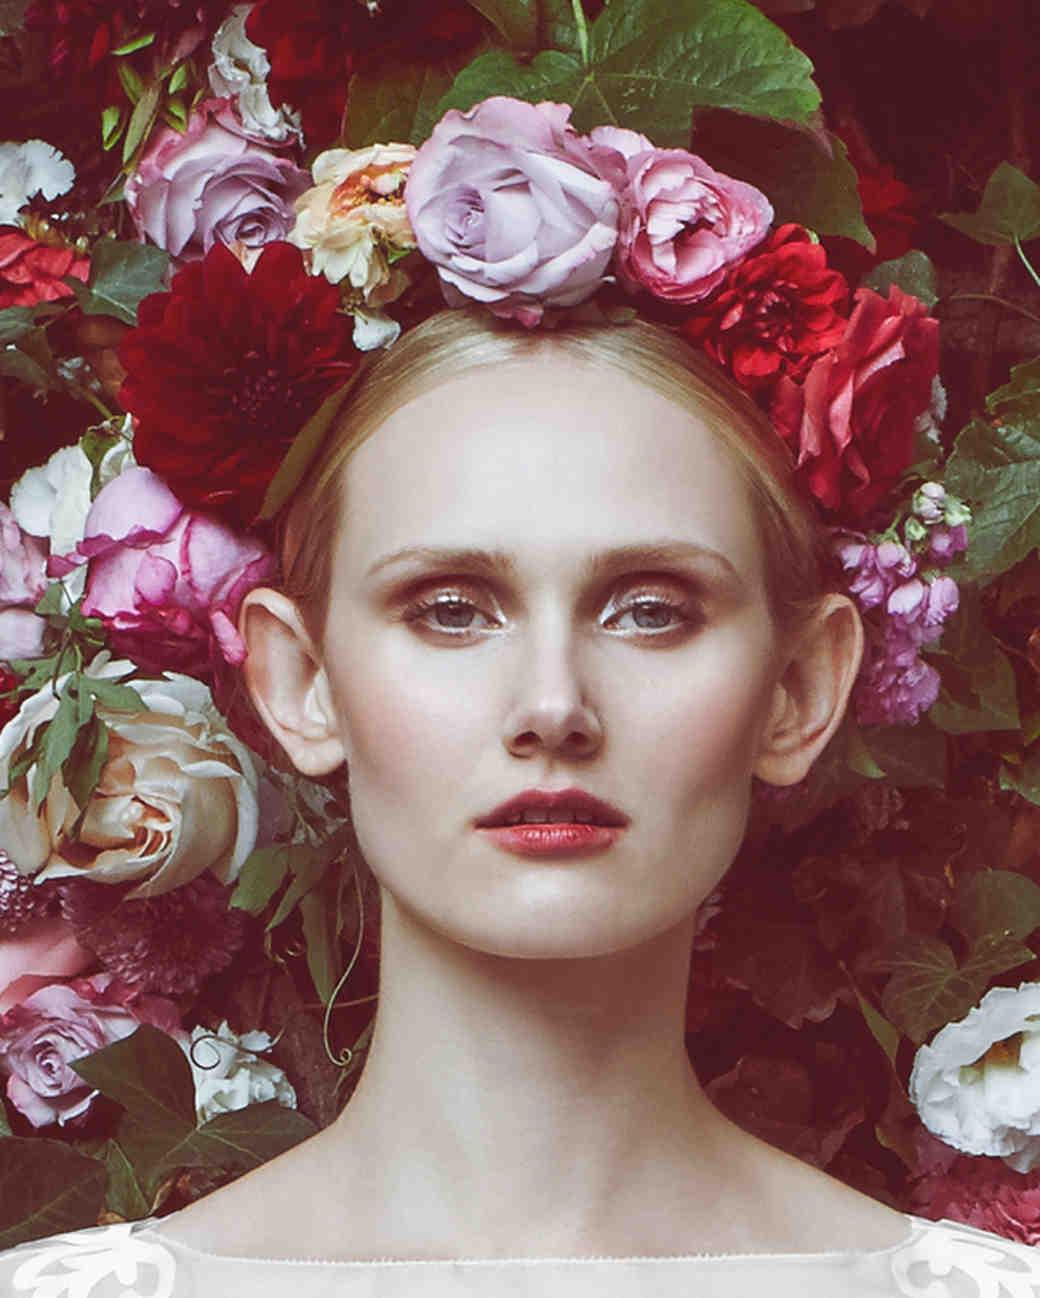 floral-hair-trend-honorxsfb-fall2015-05-1008-006-1114.jpg